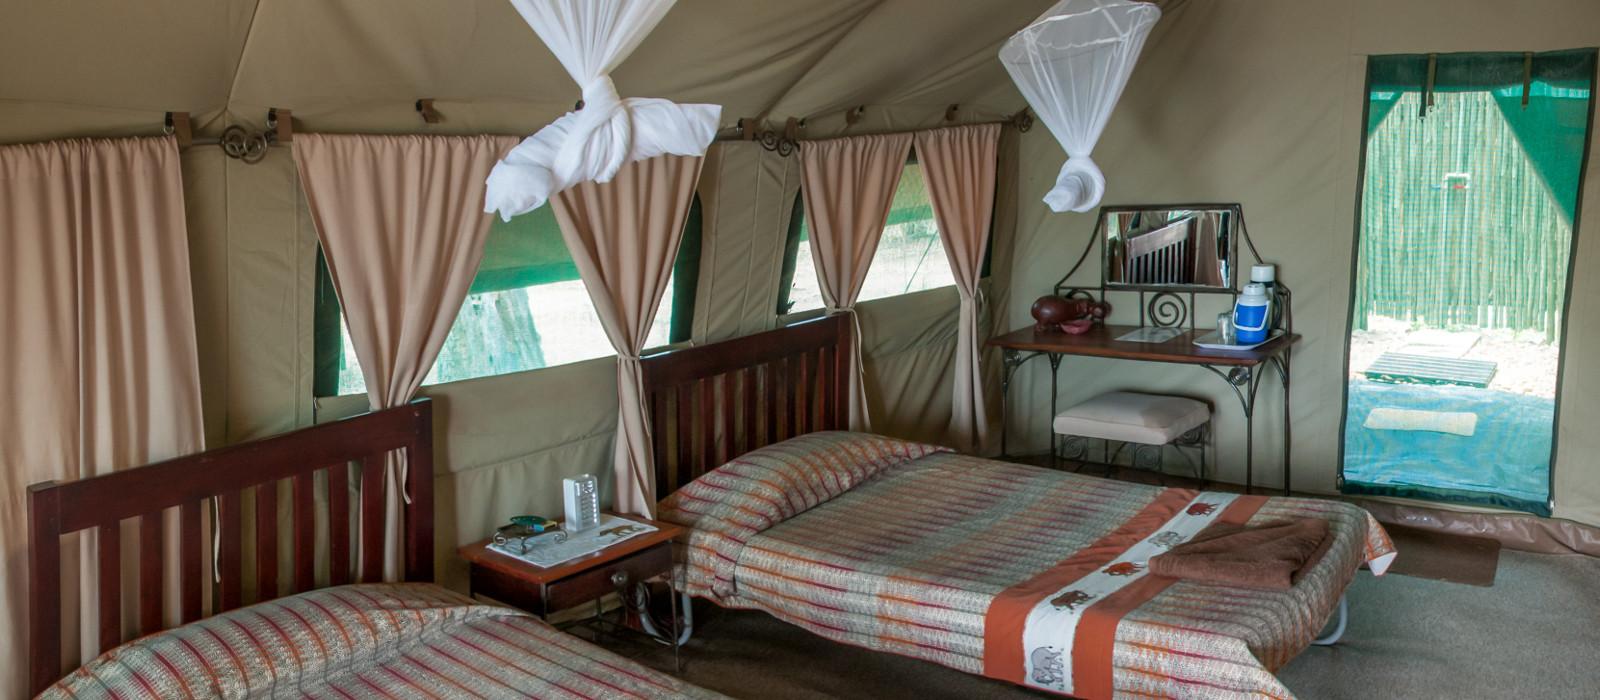 Hotel Goliath Safaris Tented Camp Simbabwe